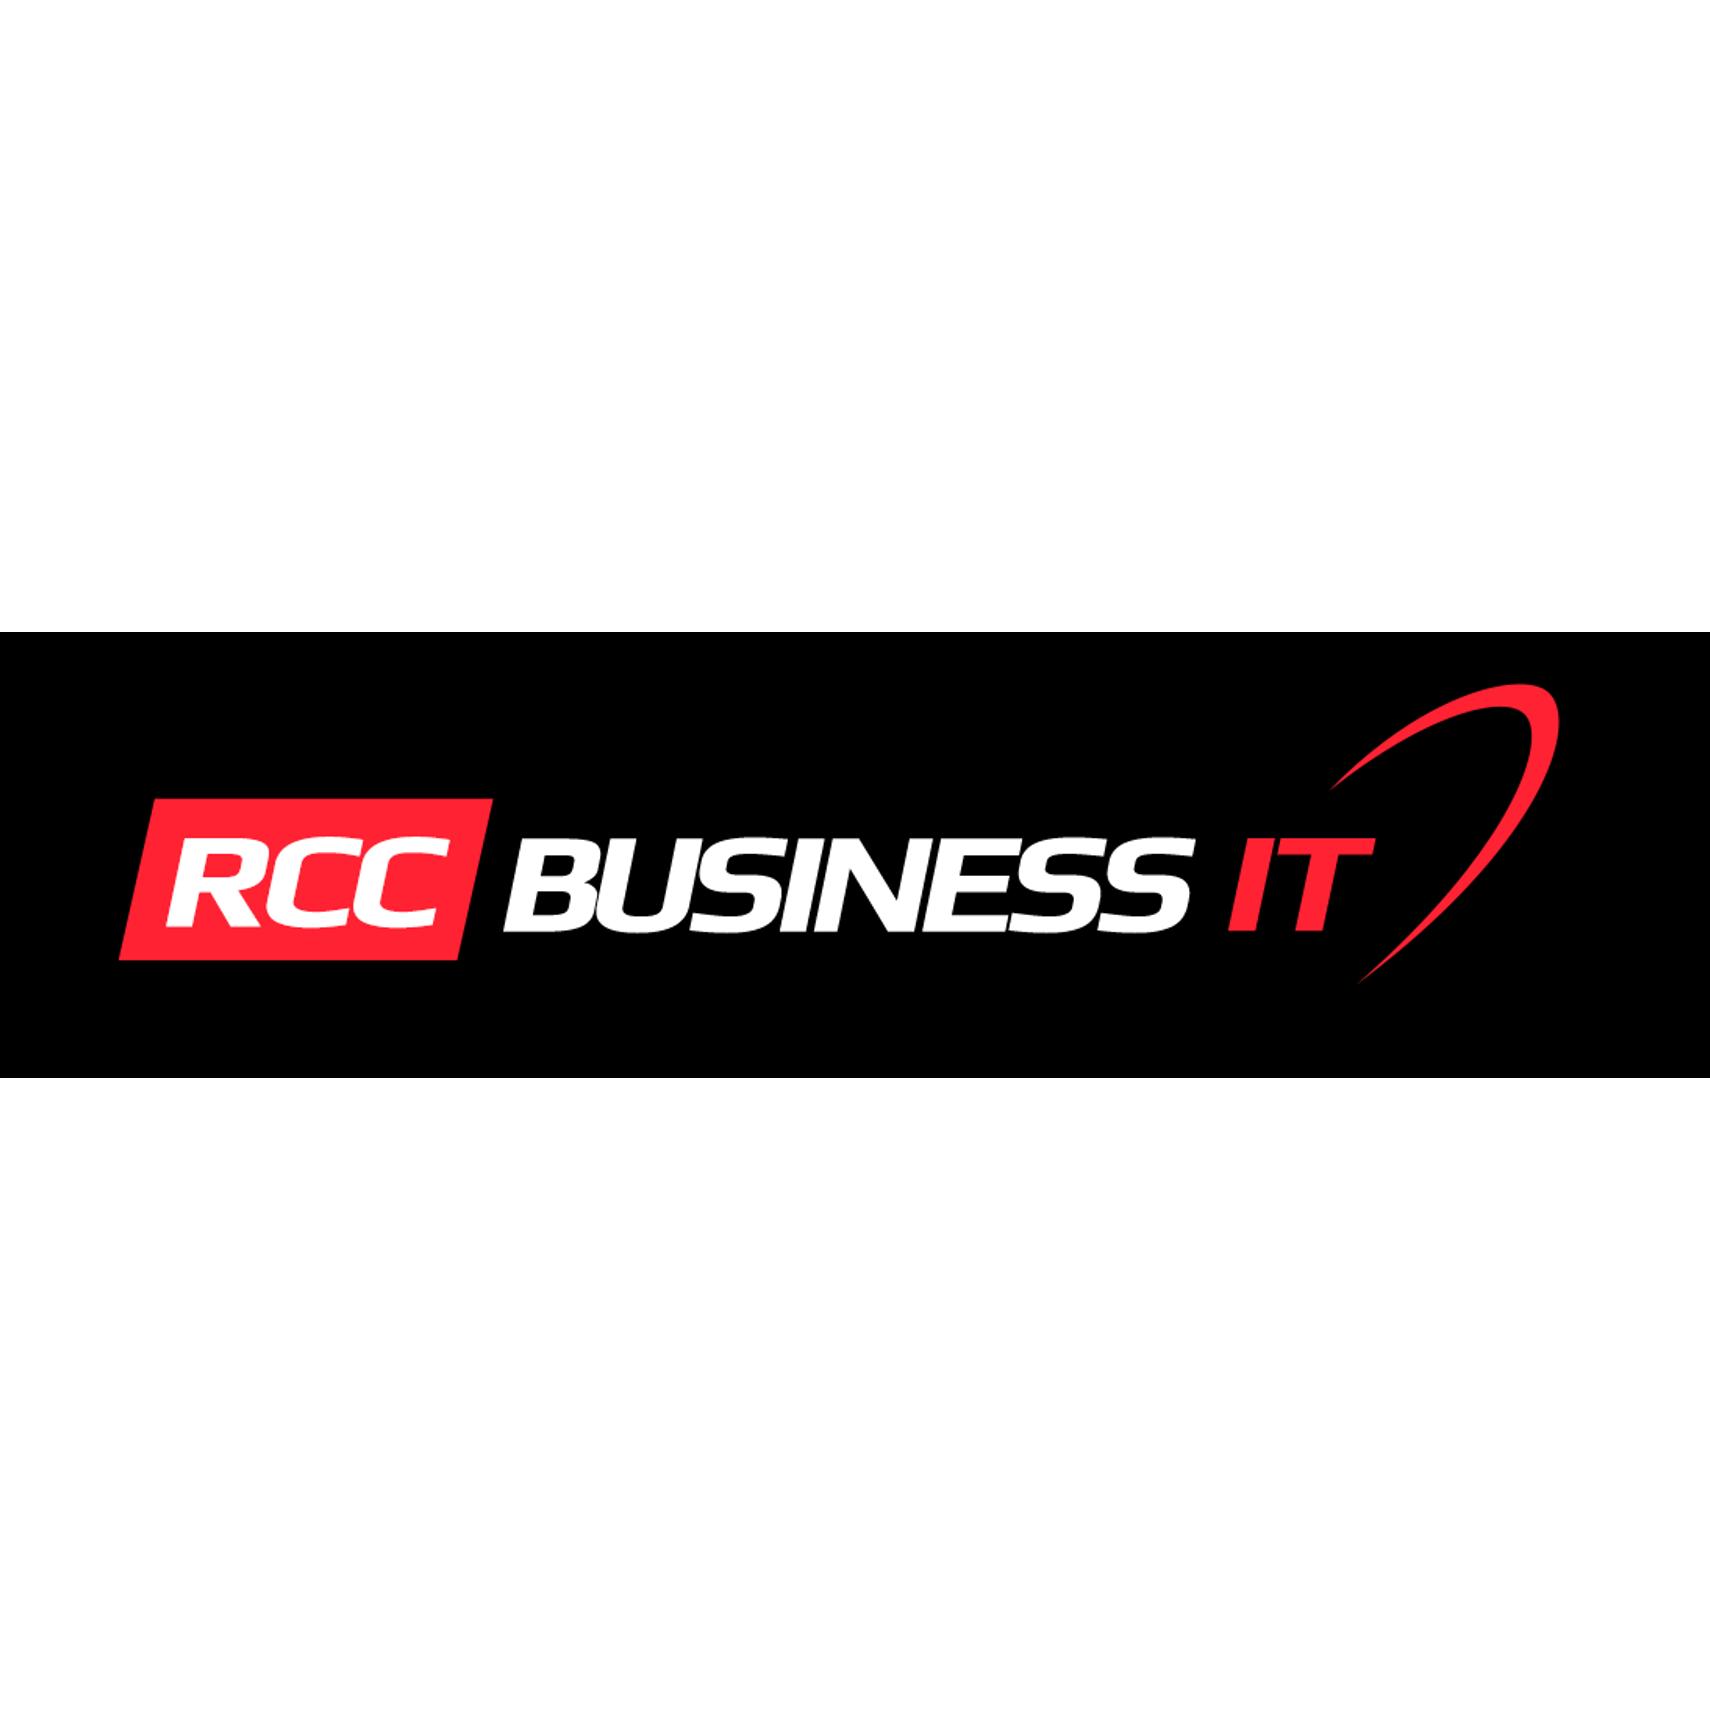 RCC Business IT - Romeo, MI 48065 - (888)228-8101 | ShowMeLocal.com